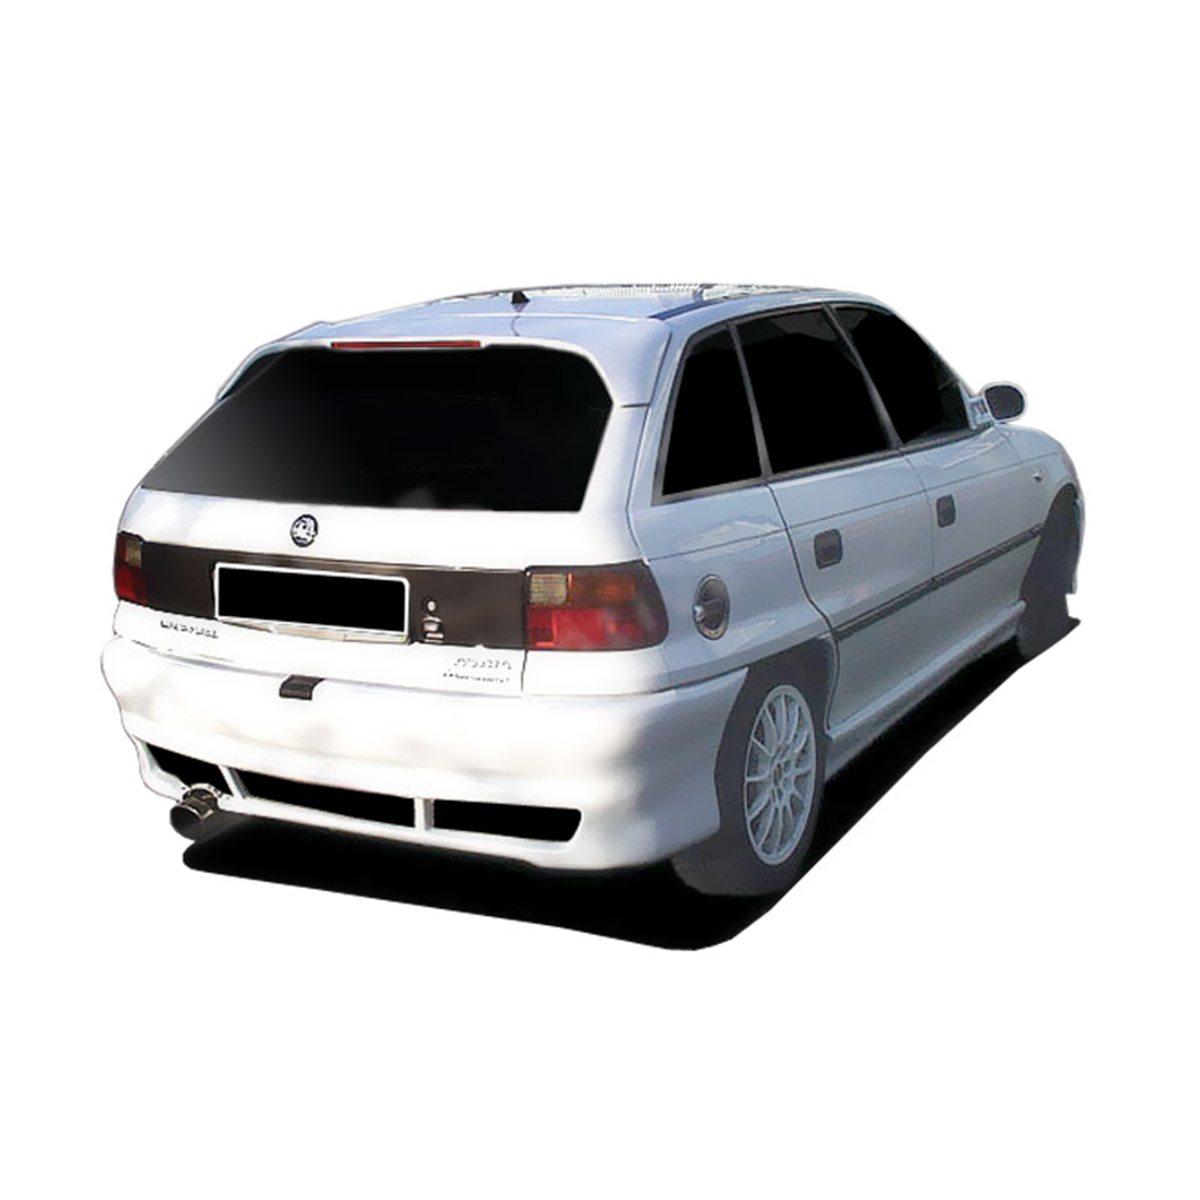 Opel-Astra-F-Hyper-2-Tras-PCA220